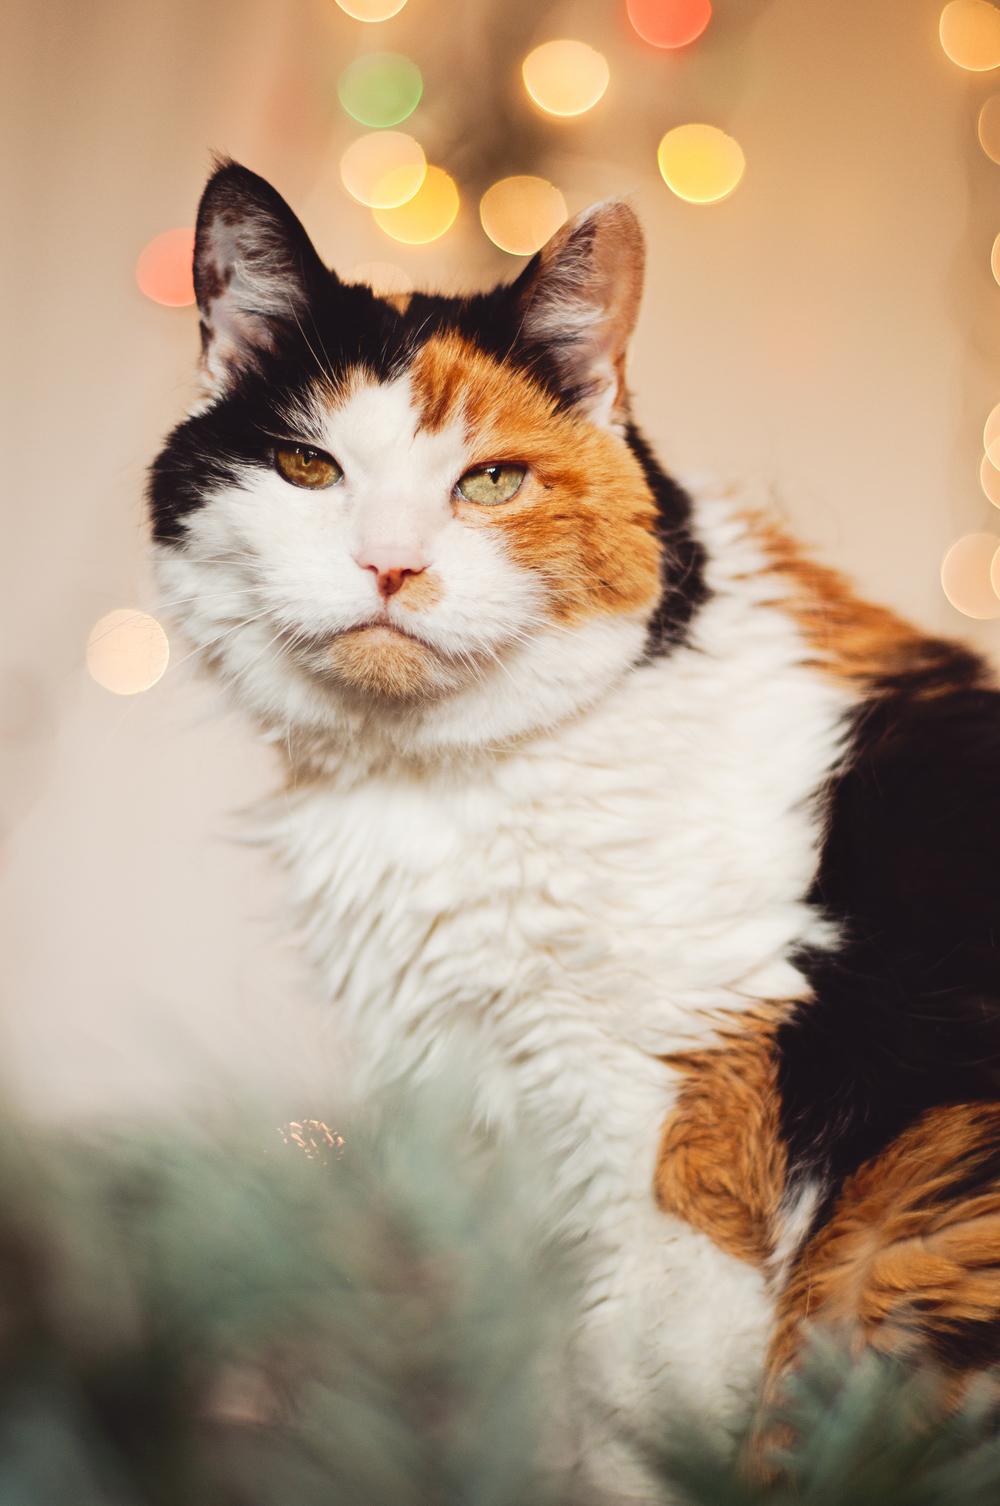 pet-photography-studio-natural-light-lifestyle-cat-holiday-long-island-photographer-digital-2.jpg